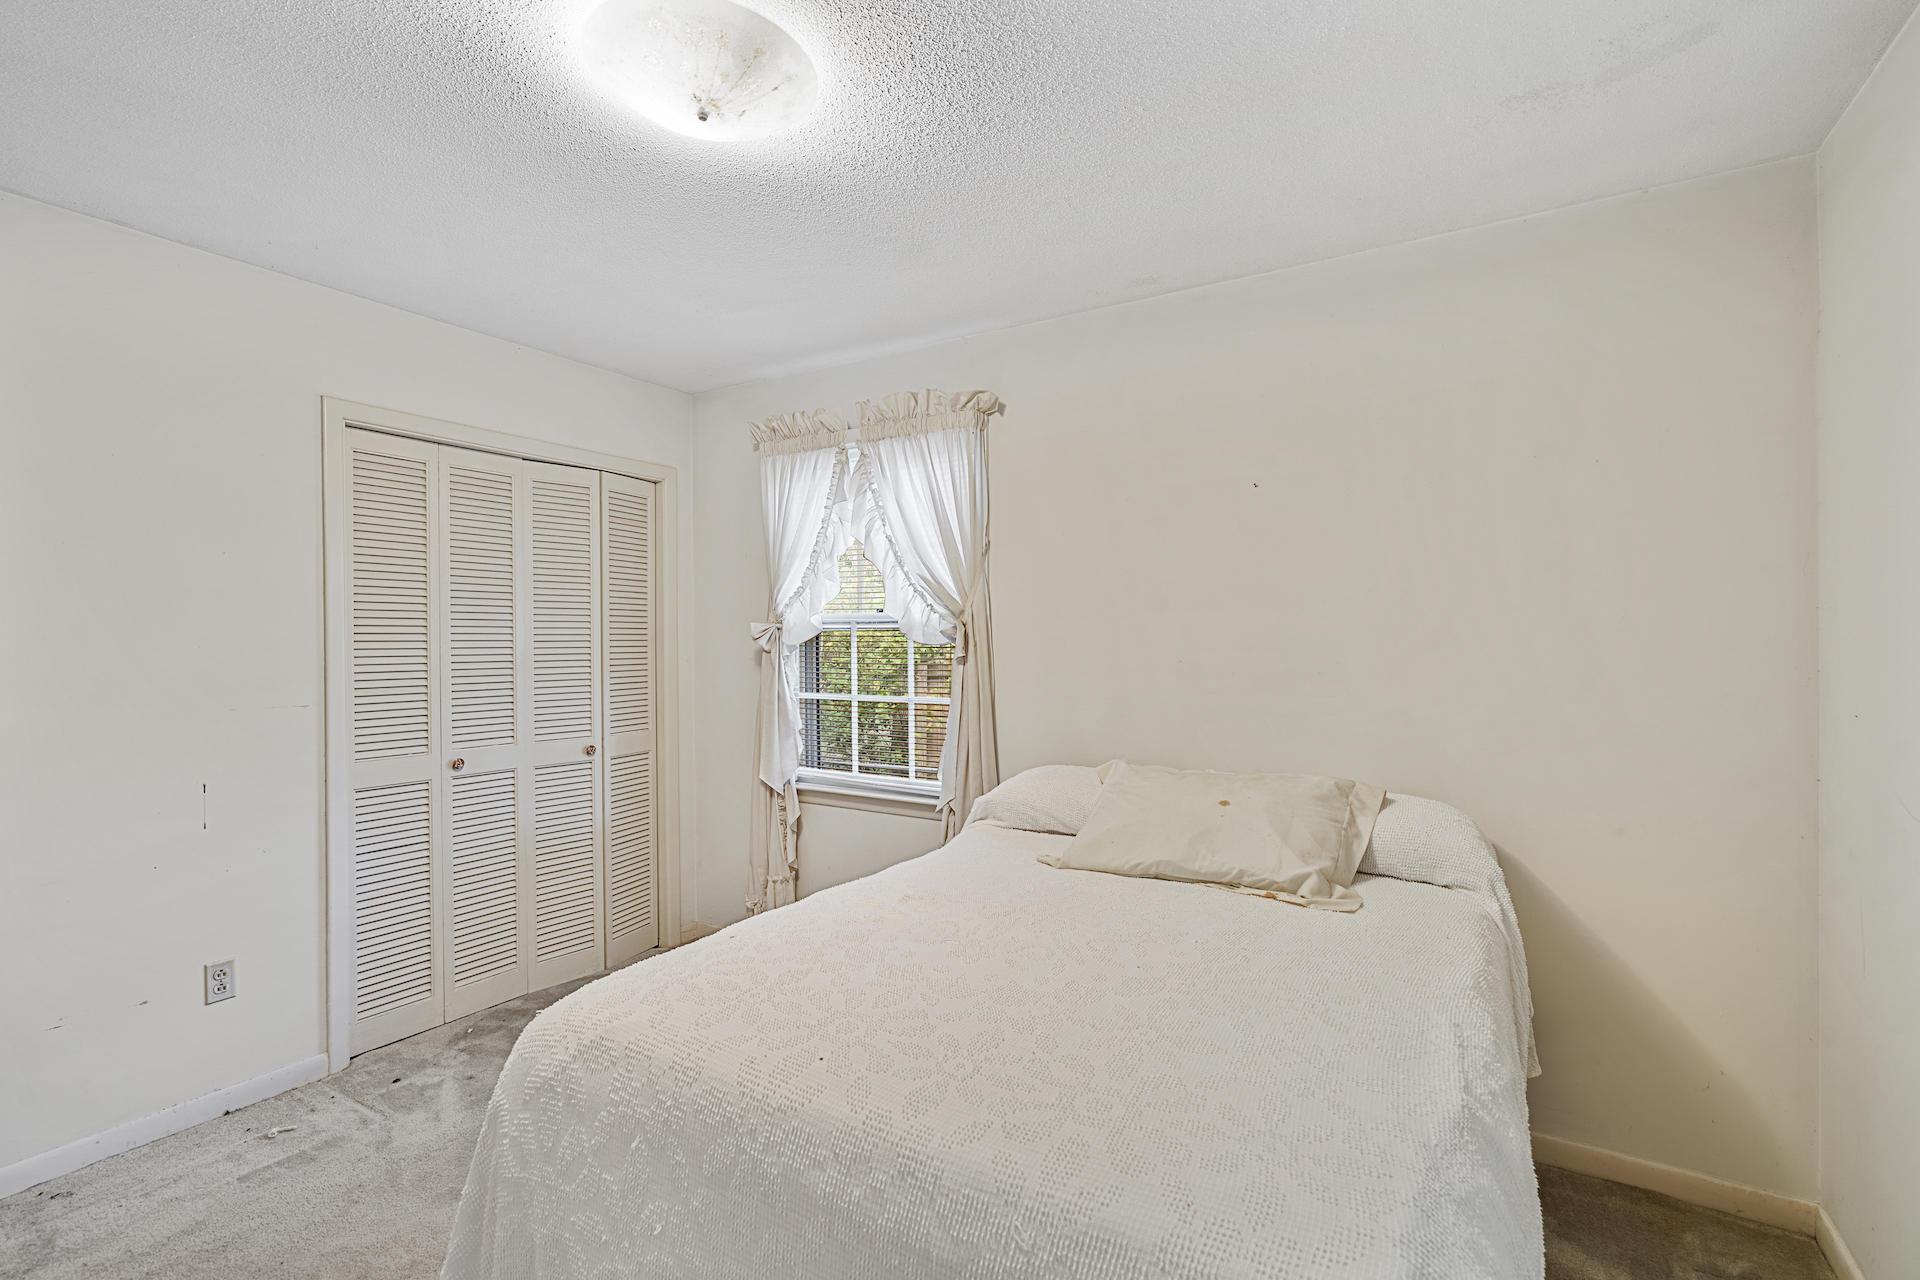 Charlestowne Estates I Homes For Sale - 1137 Culpepper, Charleston, SC - 11